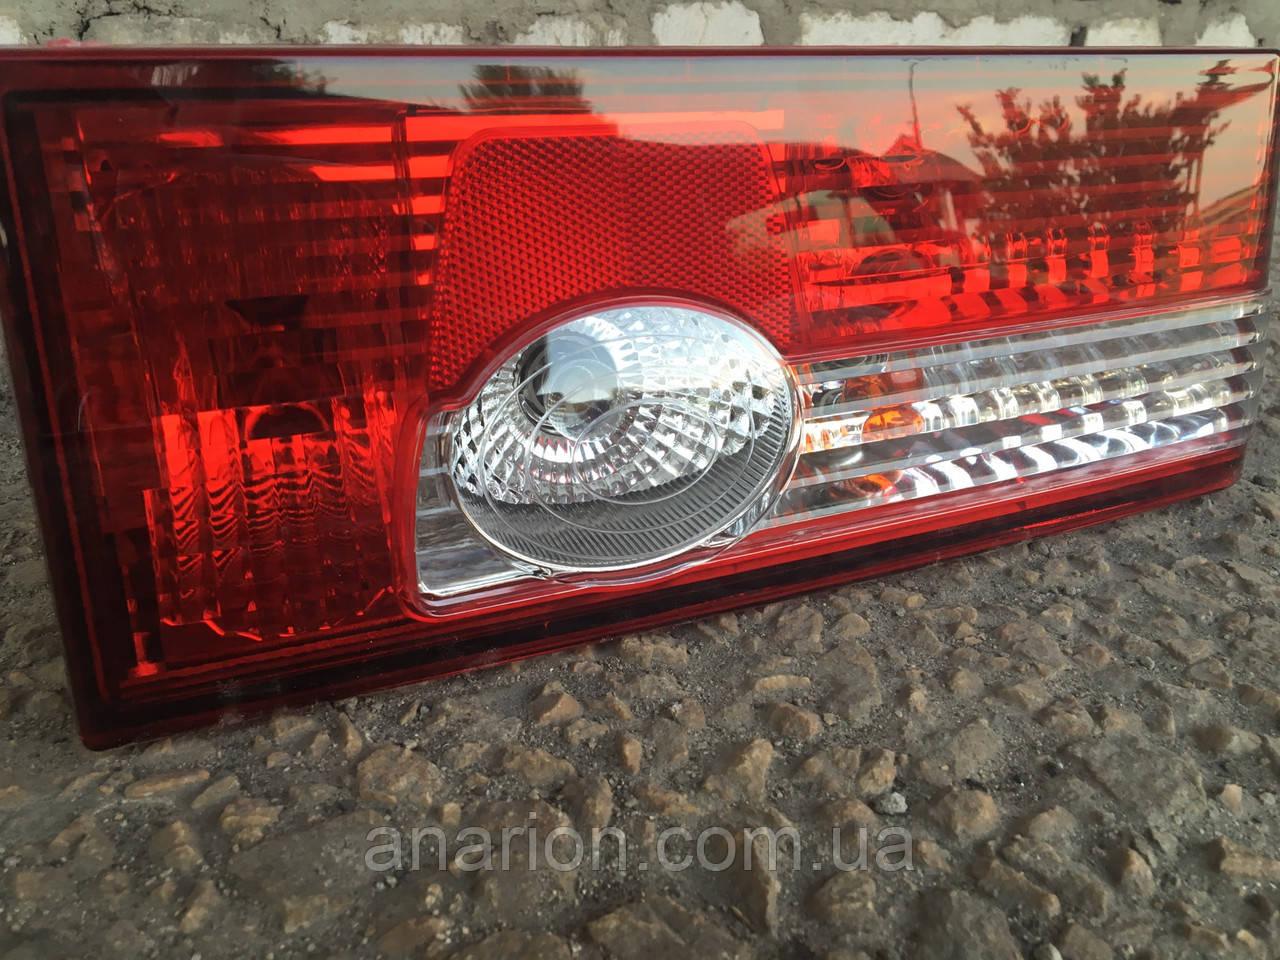 Задние фонари на ВАЗ 21099 Освар №2 (красные)